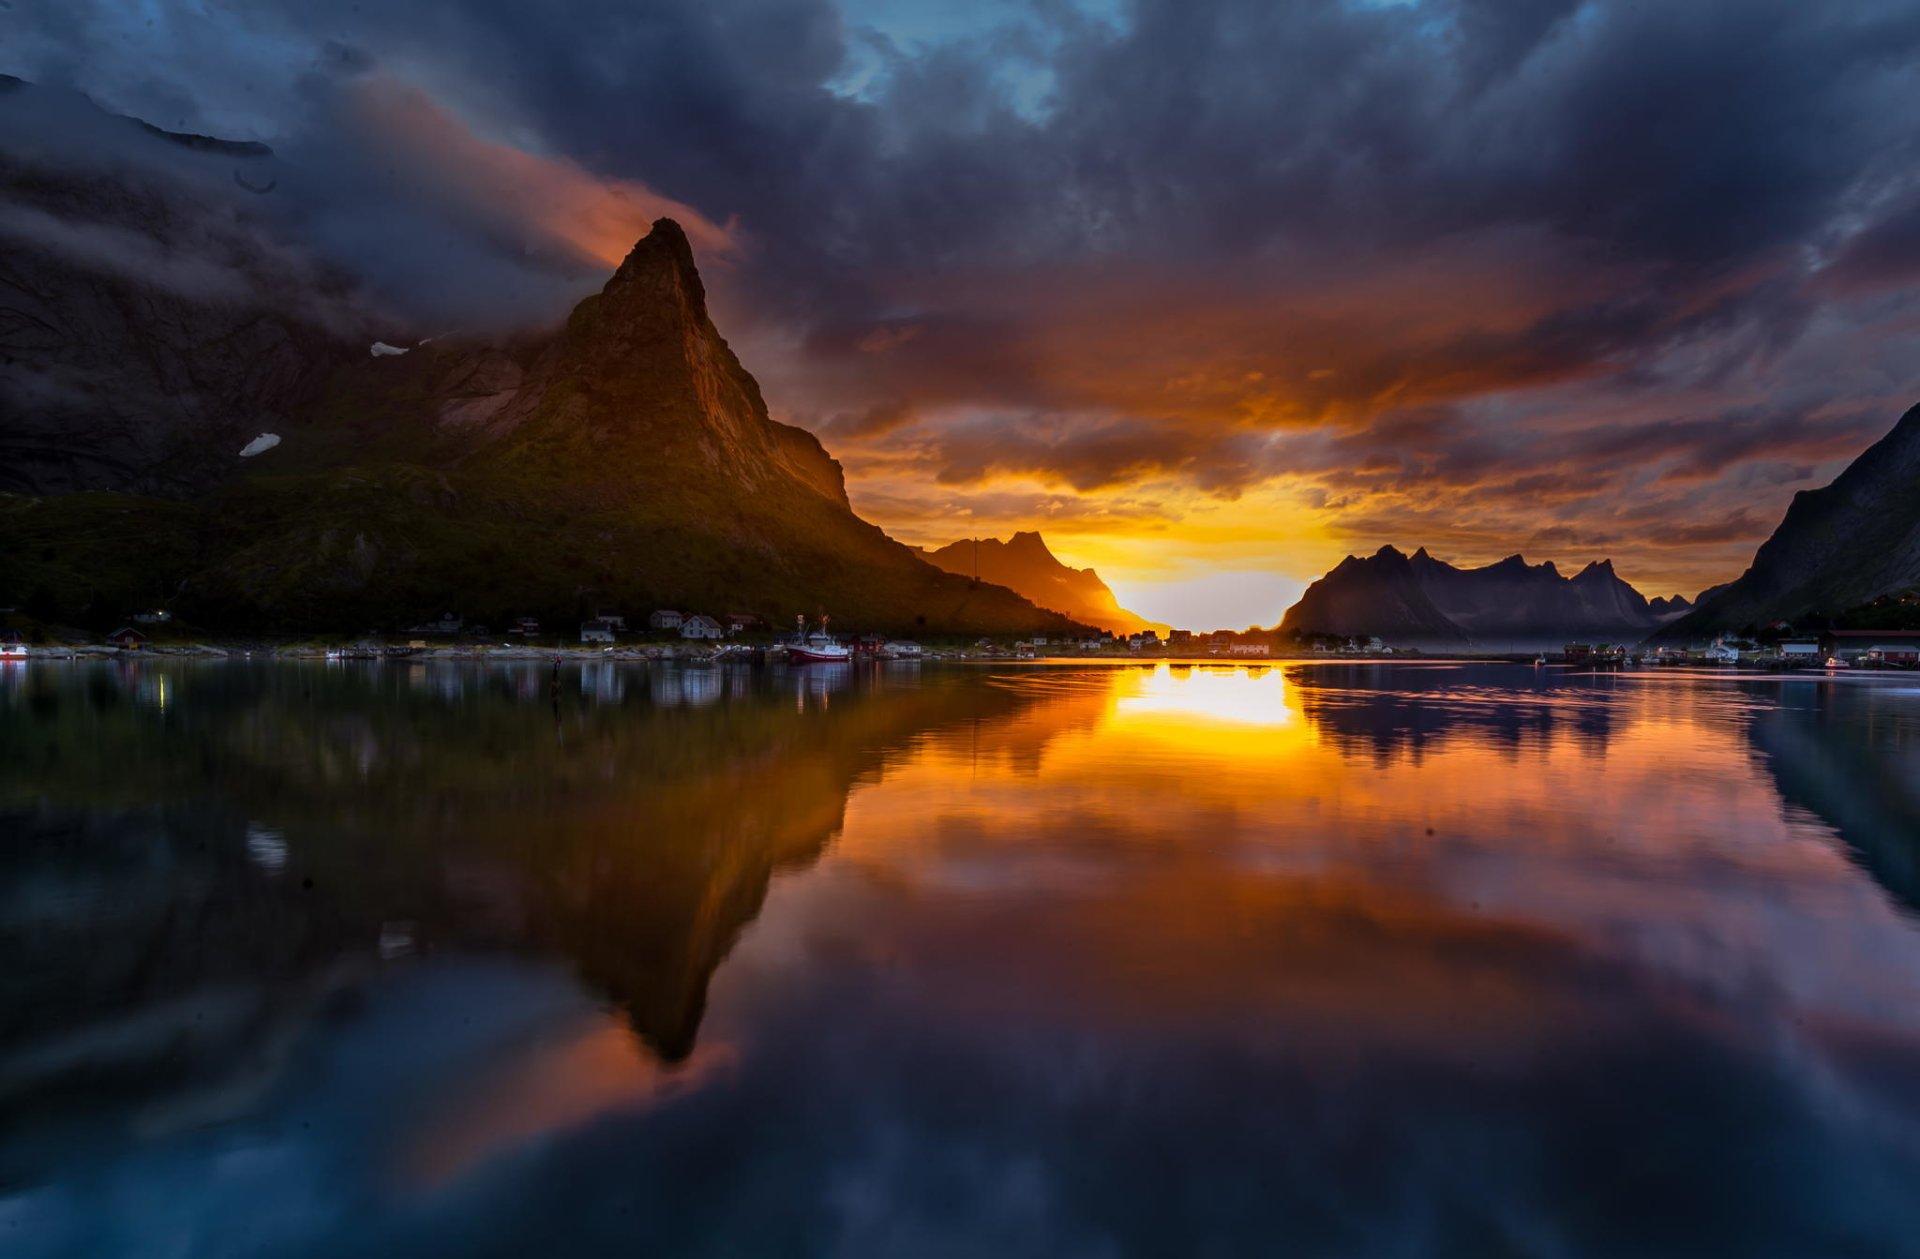 Midnight sun in artic hd wallpaper background image 2048x1343 id 570796 wallpaper abyss - Midnight wallpaper hd ...